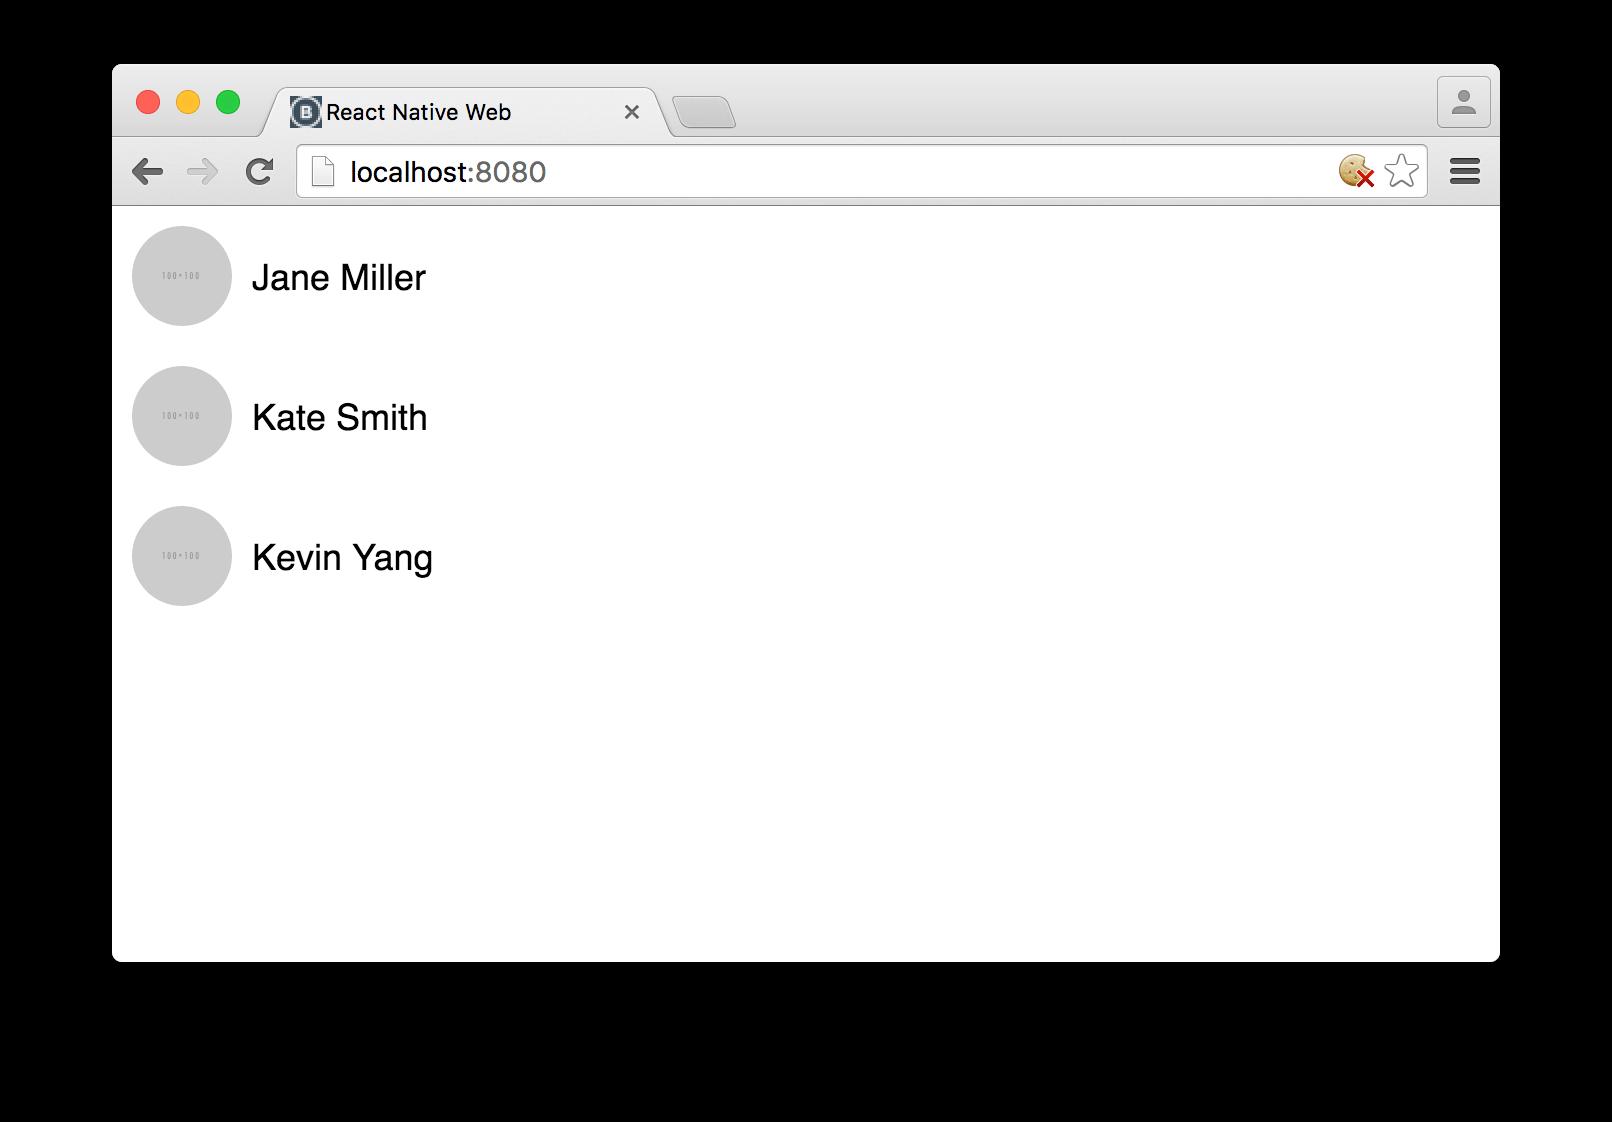 React Native For Web: A Glimpse Into The Future - 众成翻译